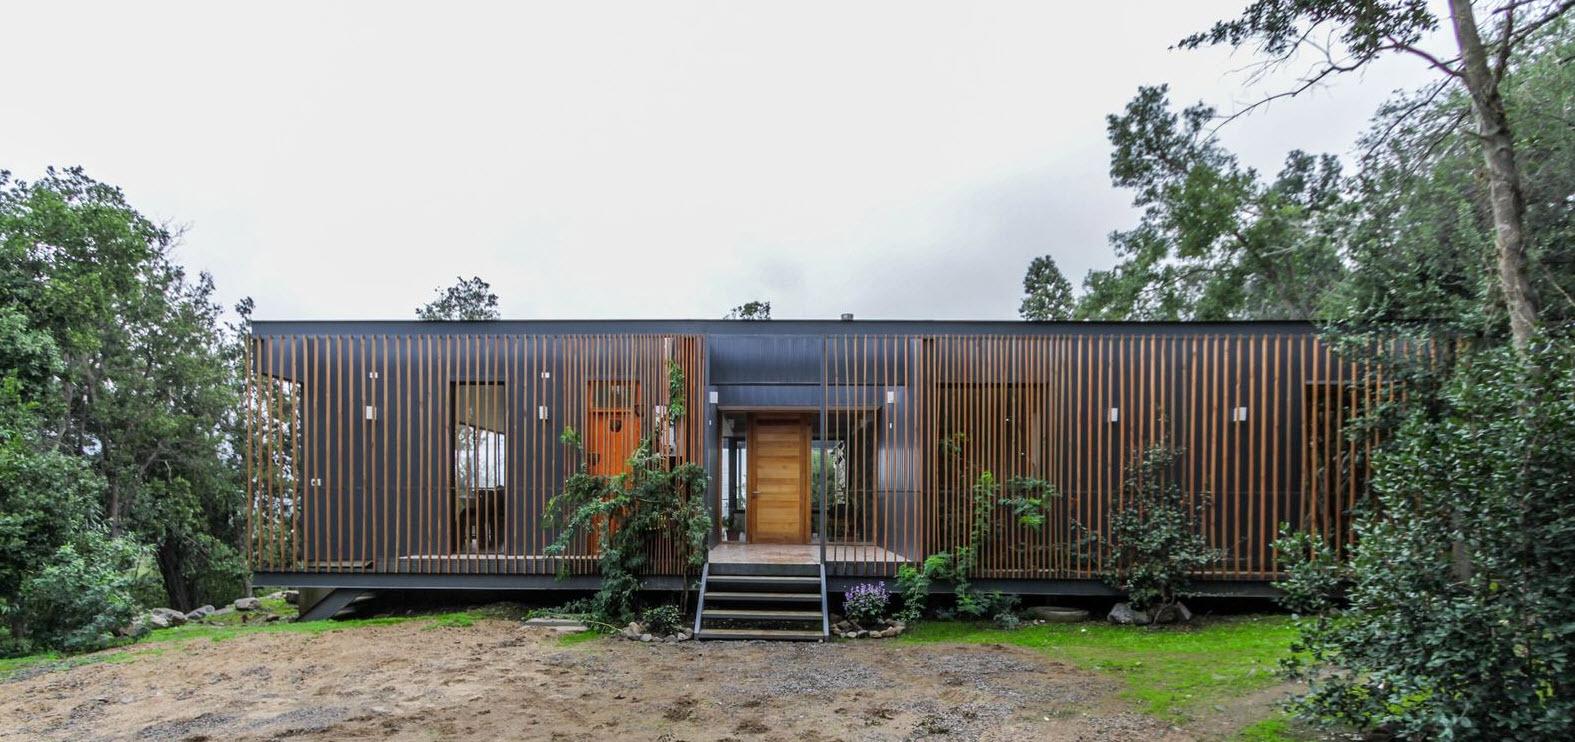 Planos casa de campo peque a y moderna construye hogar - Casas de campo madera ...